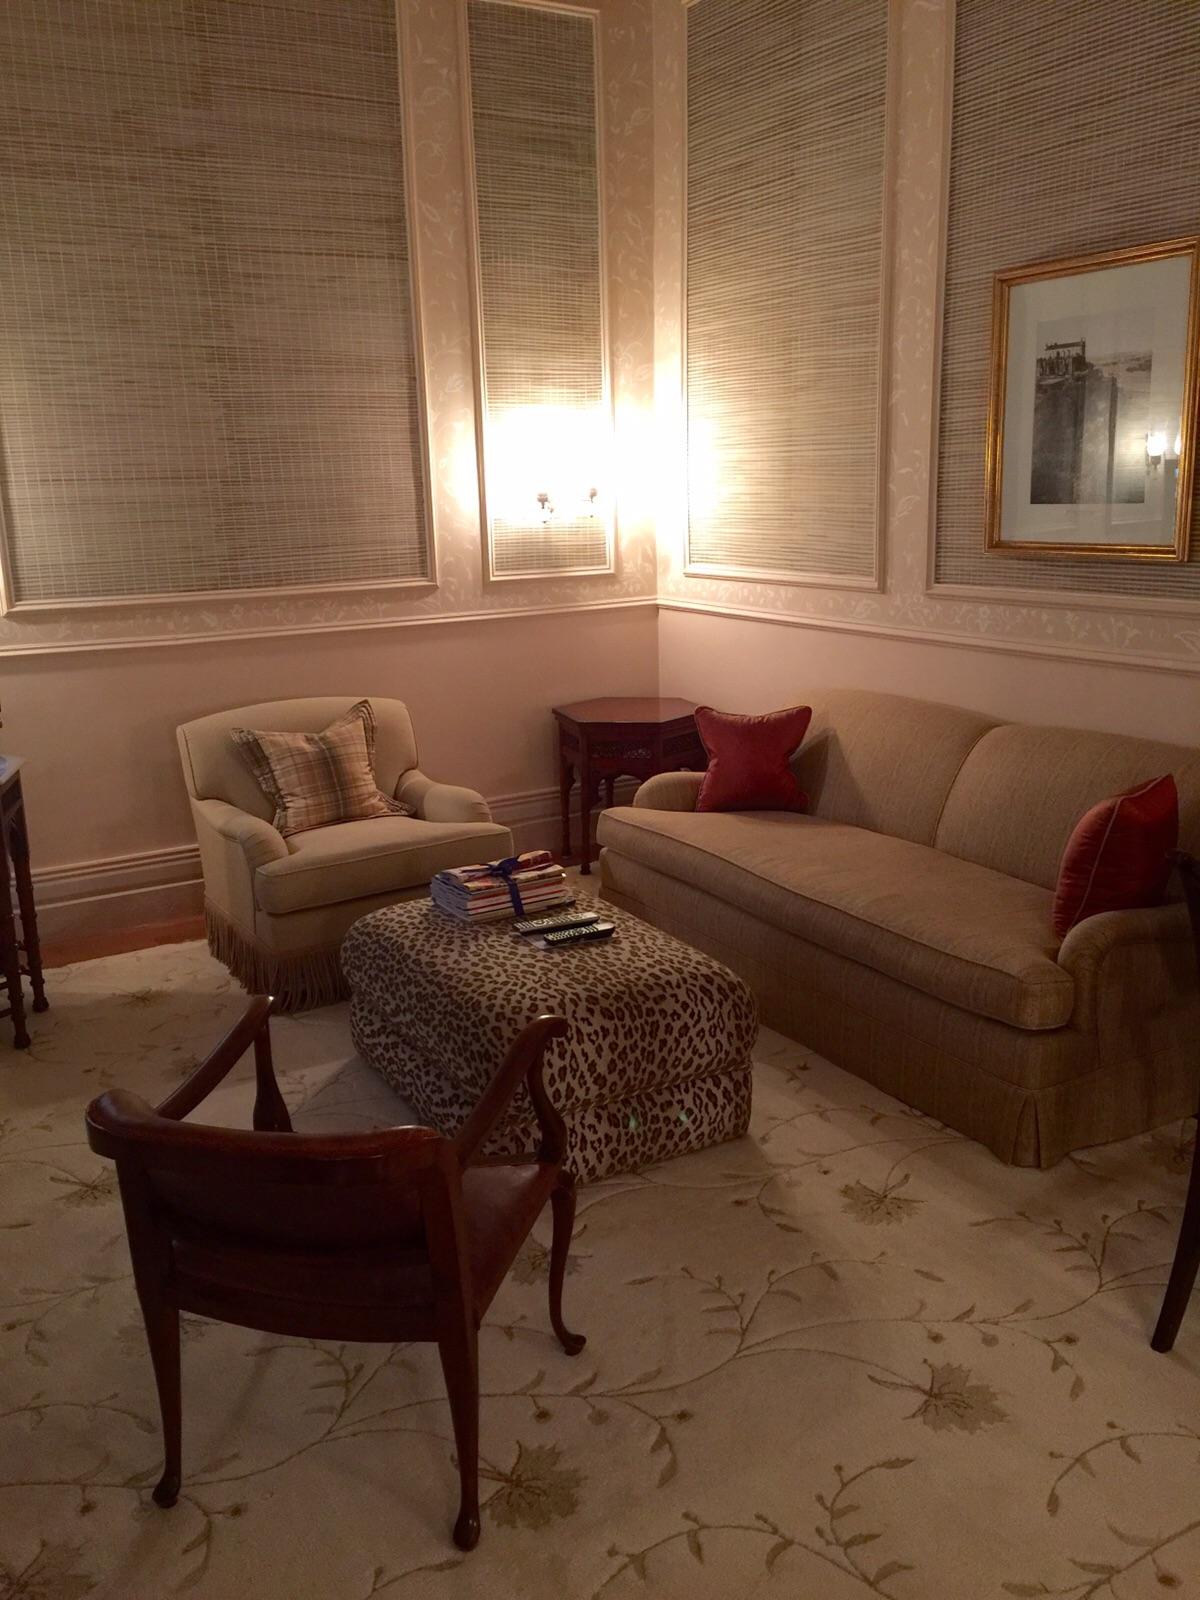 rooms taj falaknuma, luxury hotel Hyderabad, luxury palace hyderabad, Taj Falaknuma Palace Hyderabad, taj hotel hyderabad,